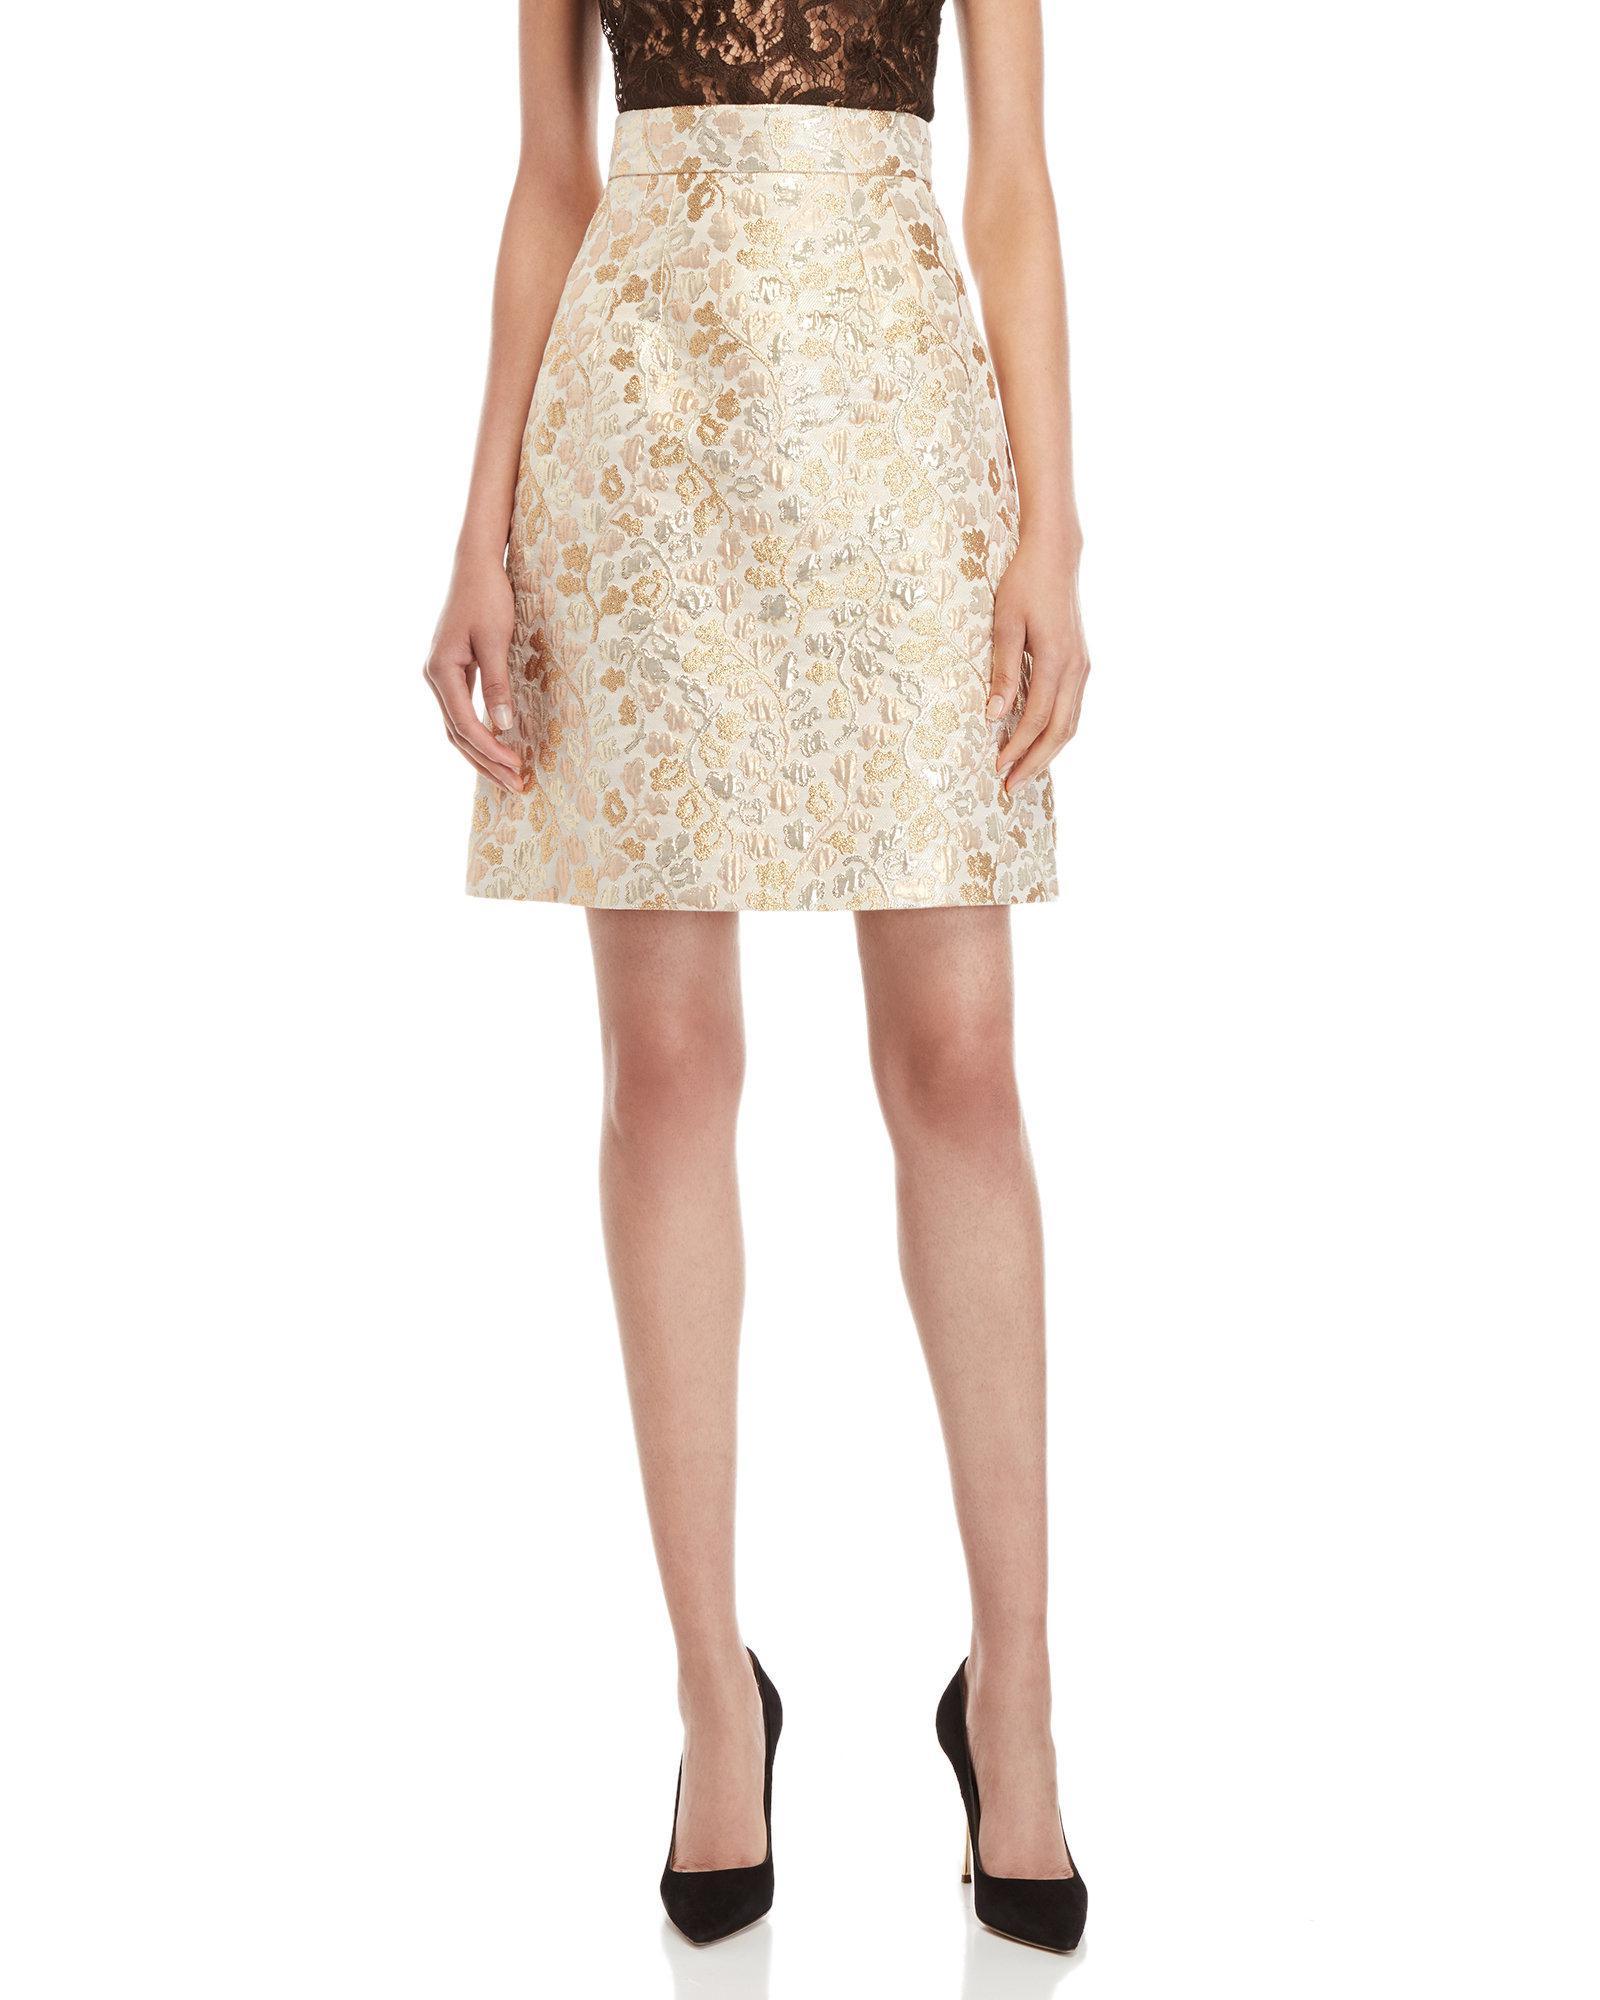 Lyst - Dolce   Gabbana Gold Brocade A-line Skirt in Metallic ef2ee18723